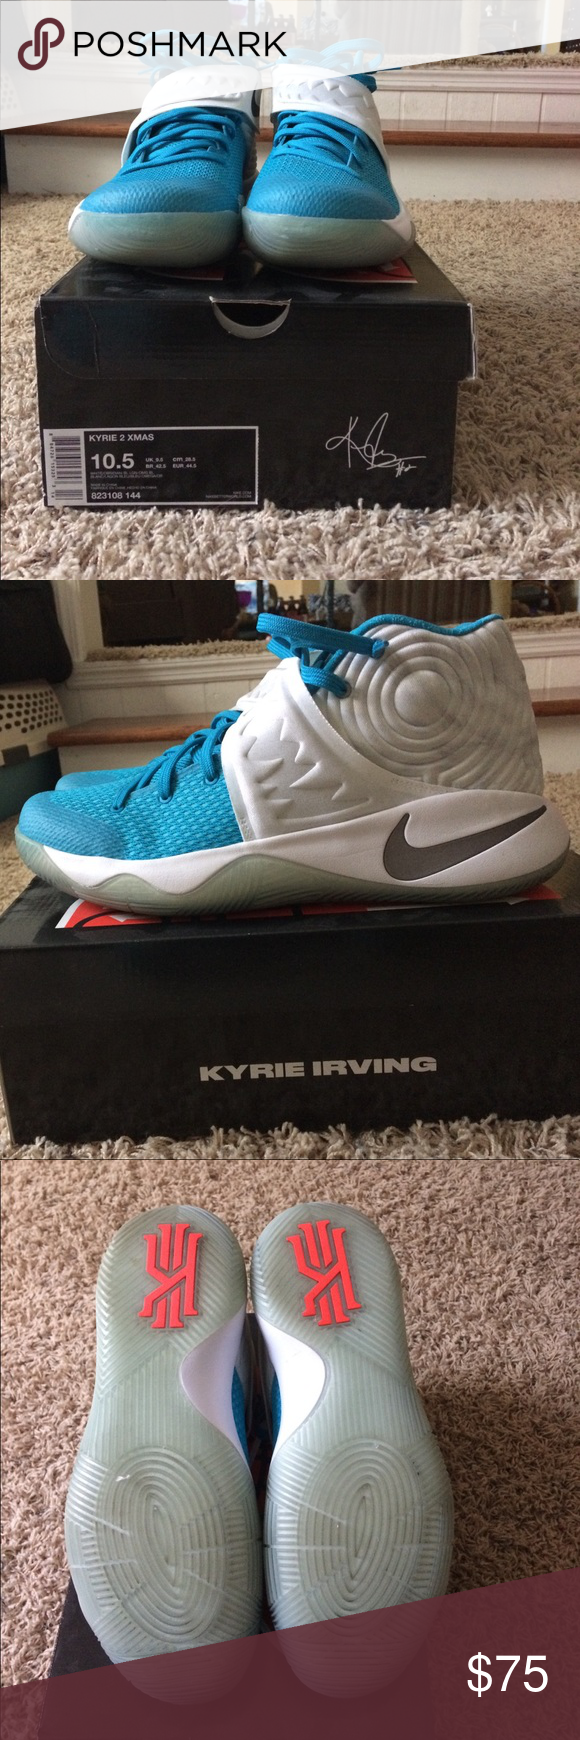 Men\'s Nike Kyrie 2 Xmas size 10.5 | My Posh Picks | Pinterest | Nike ...